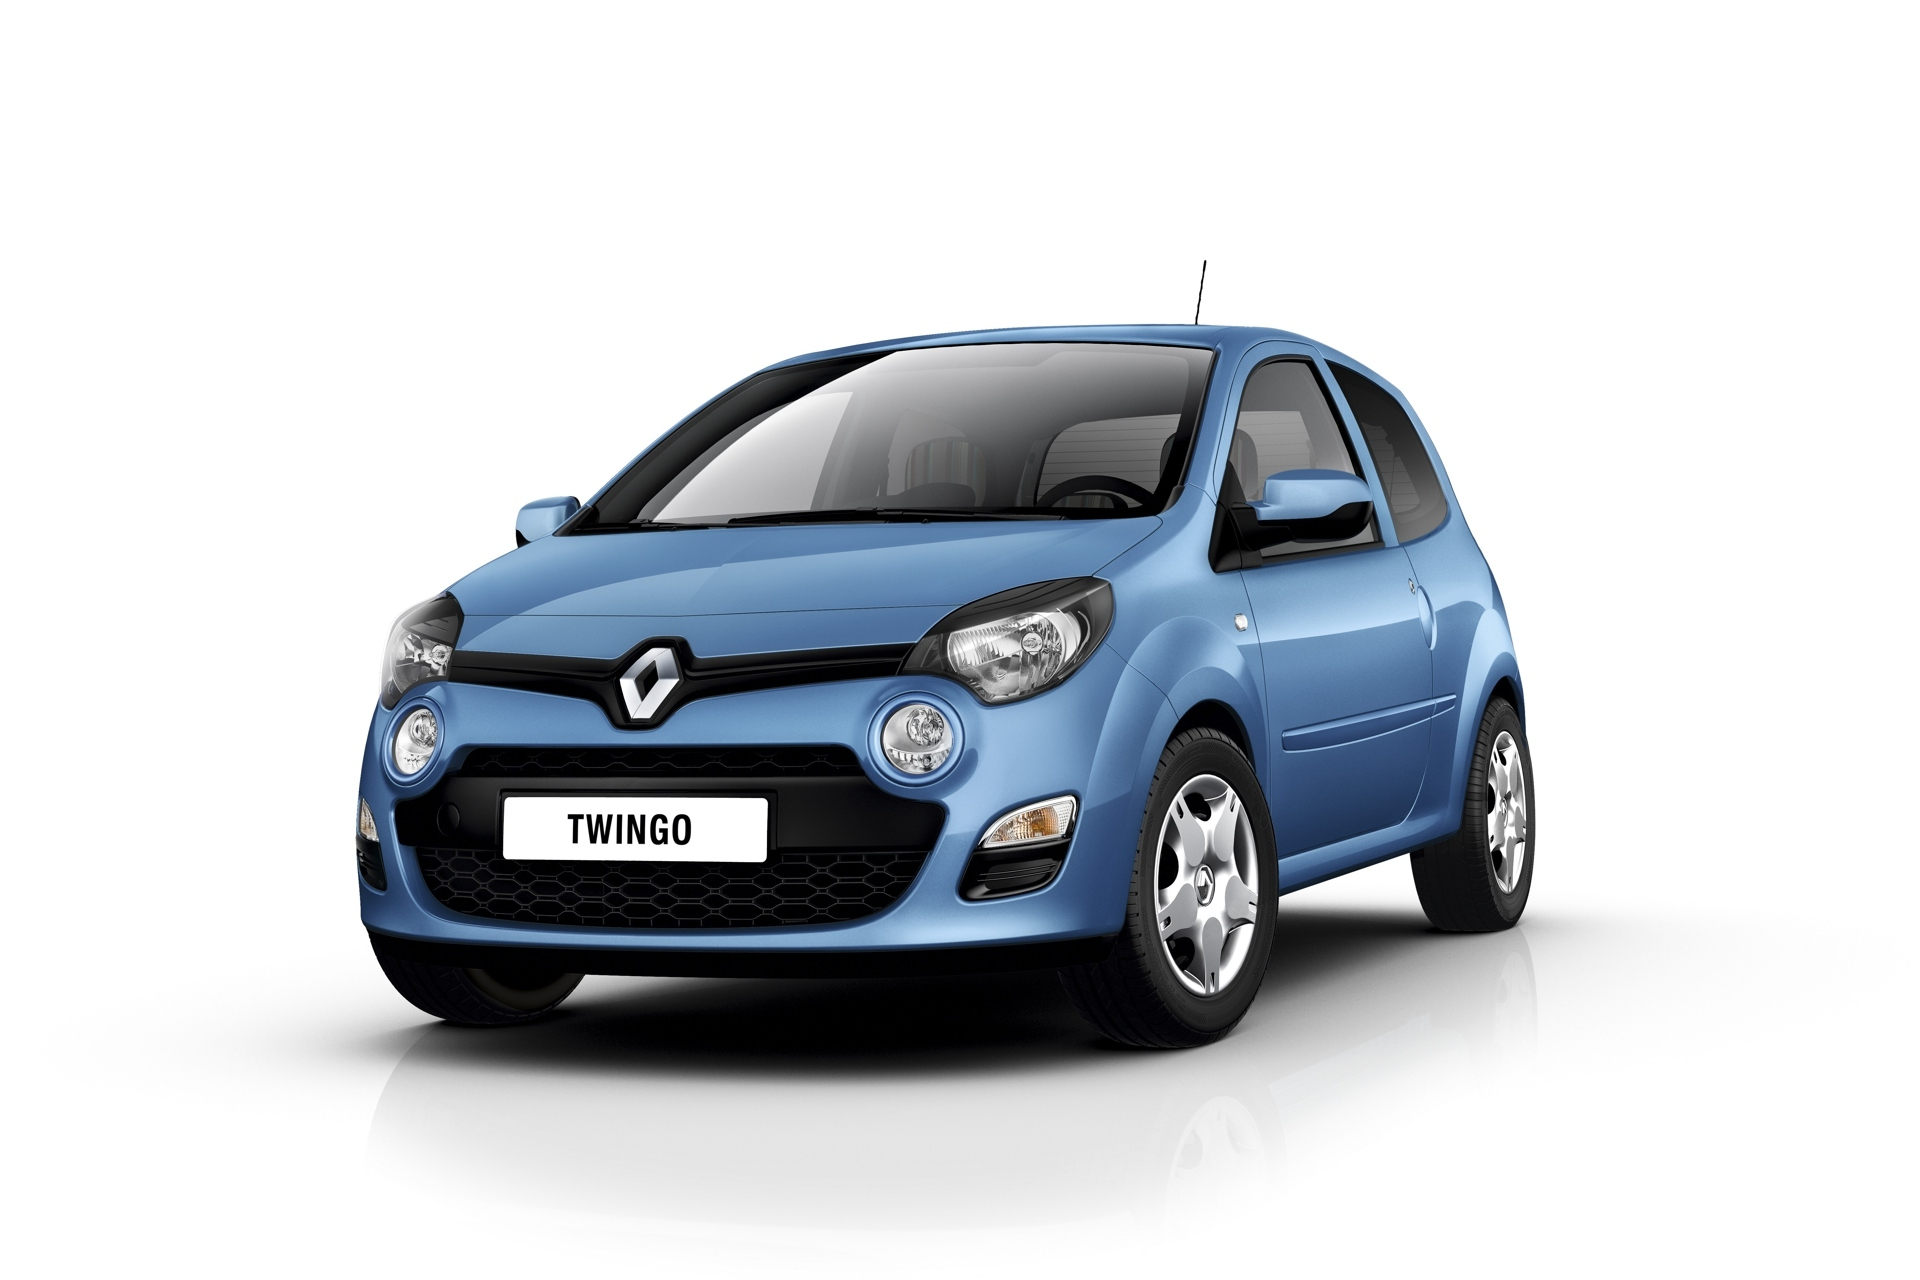 Foto de Renault Twingo (2012) (4/18)